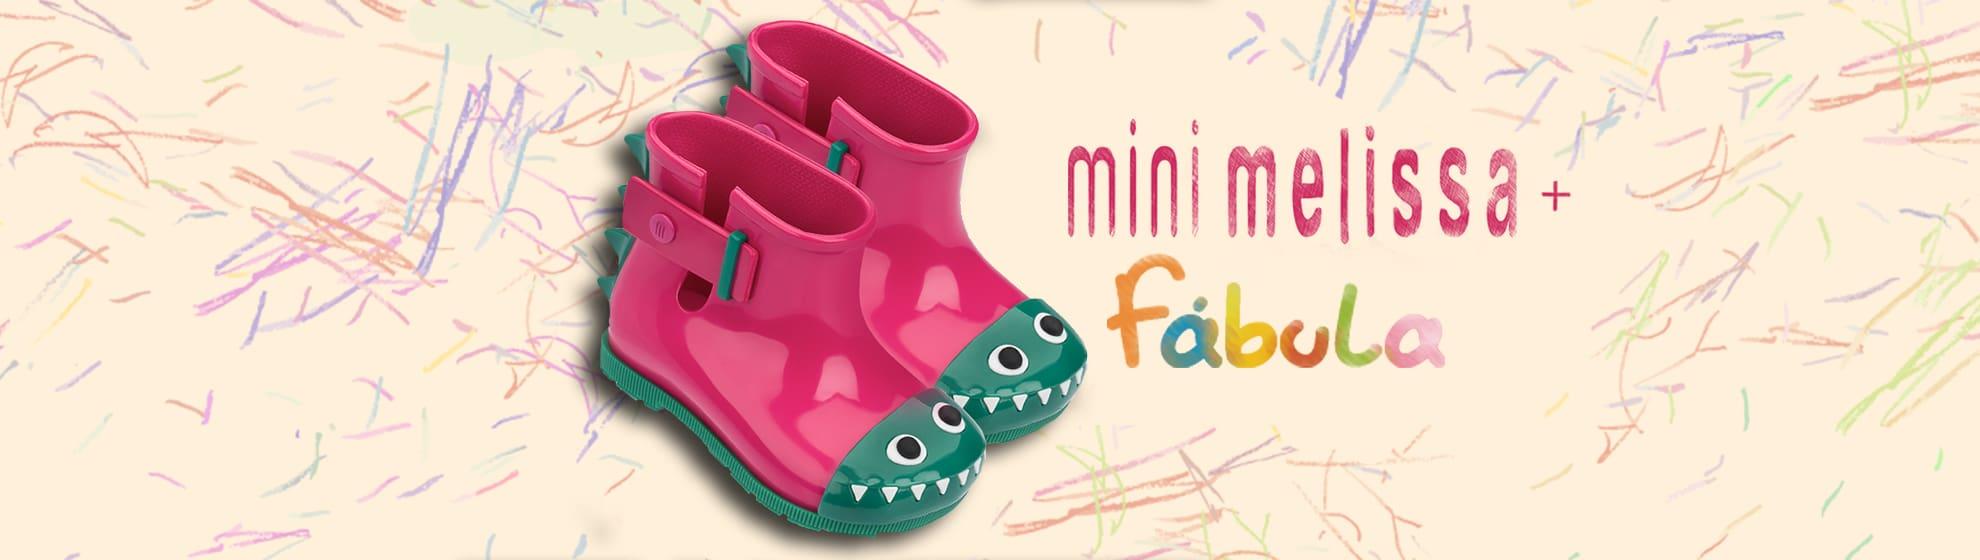 Mini Melissa Sugar Rain + Fabula